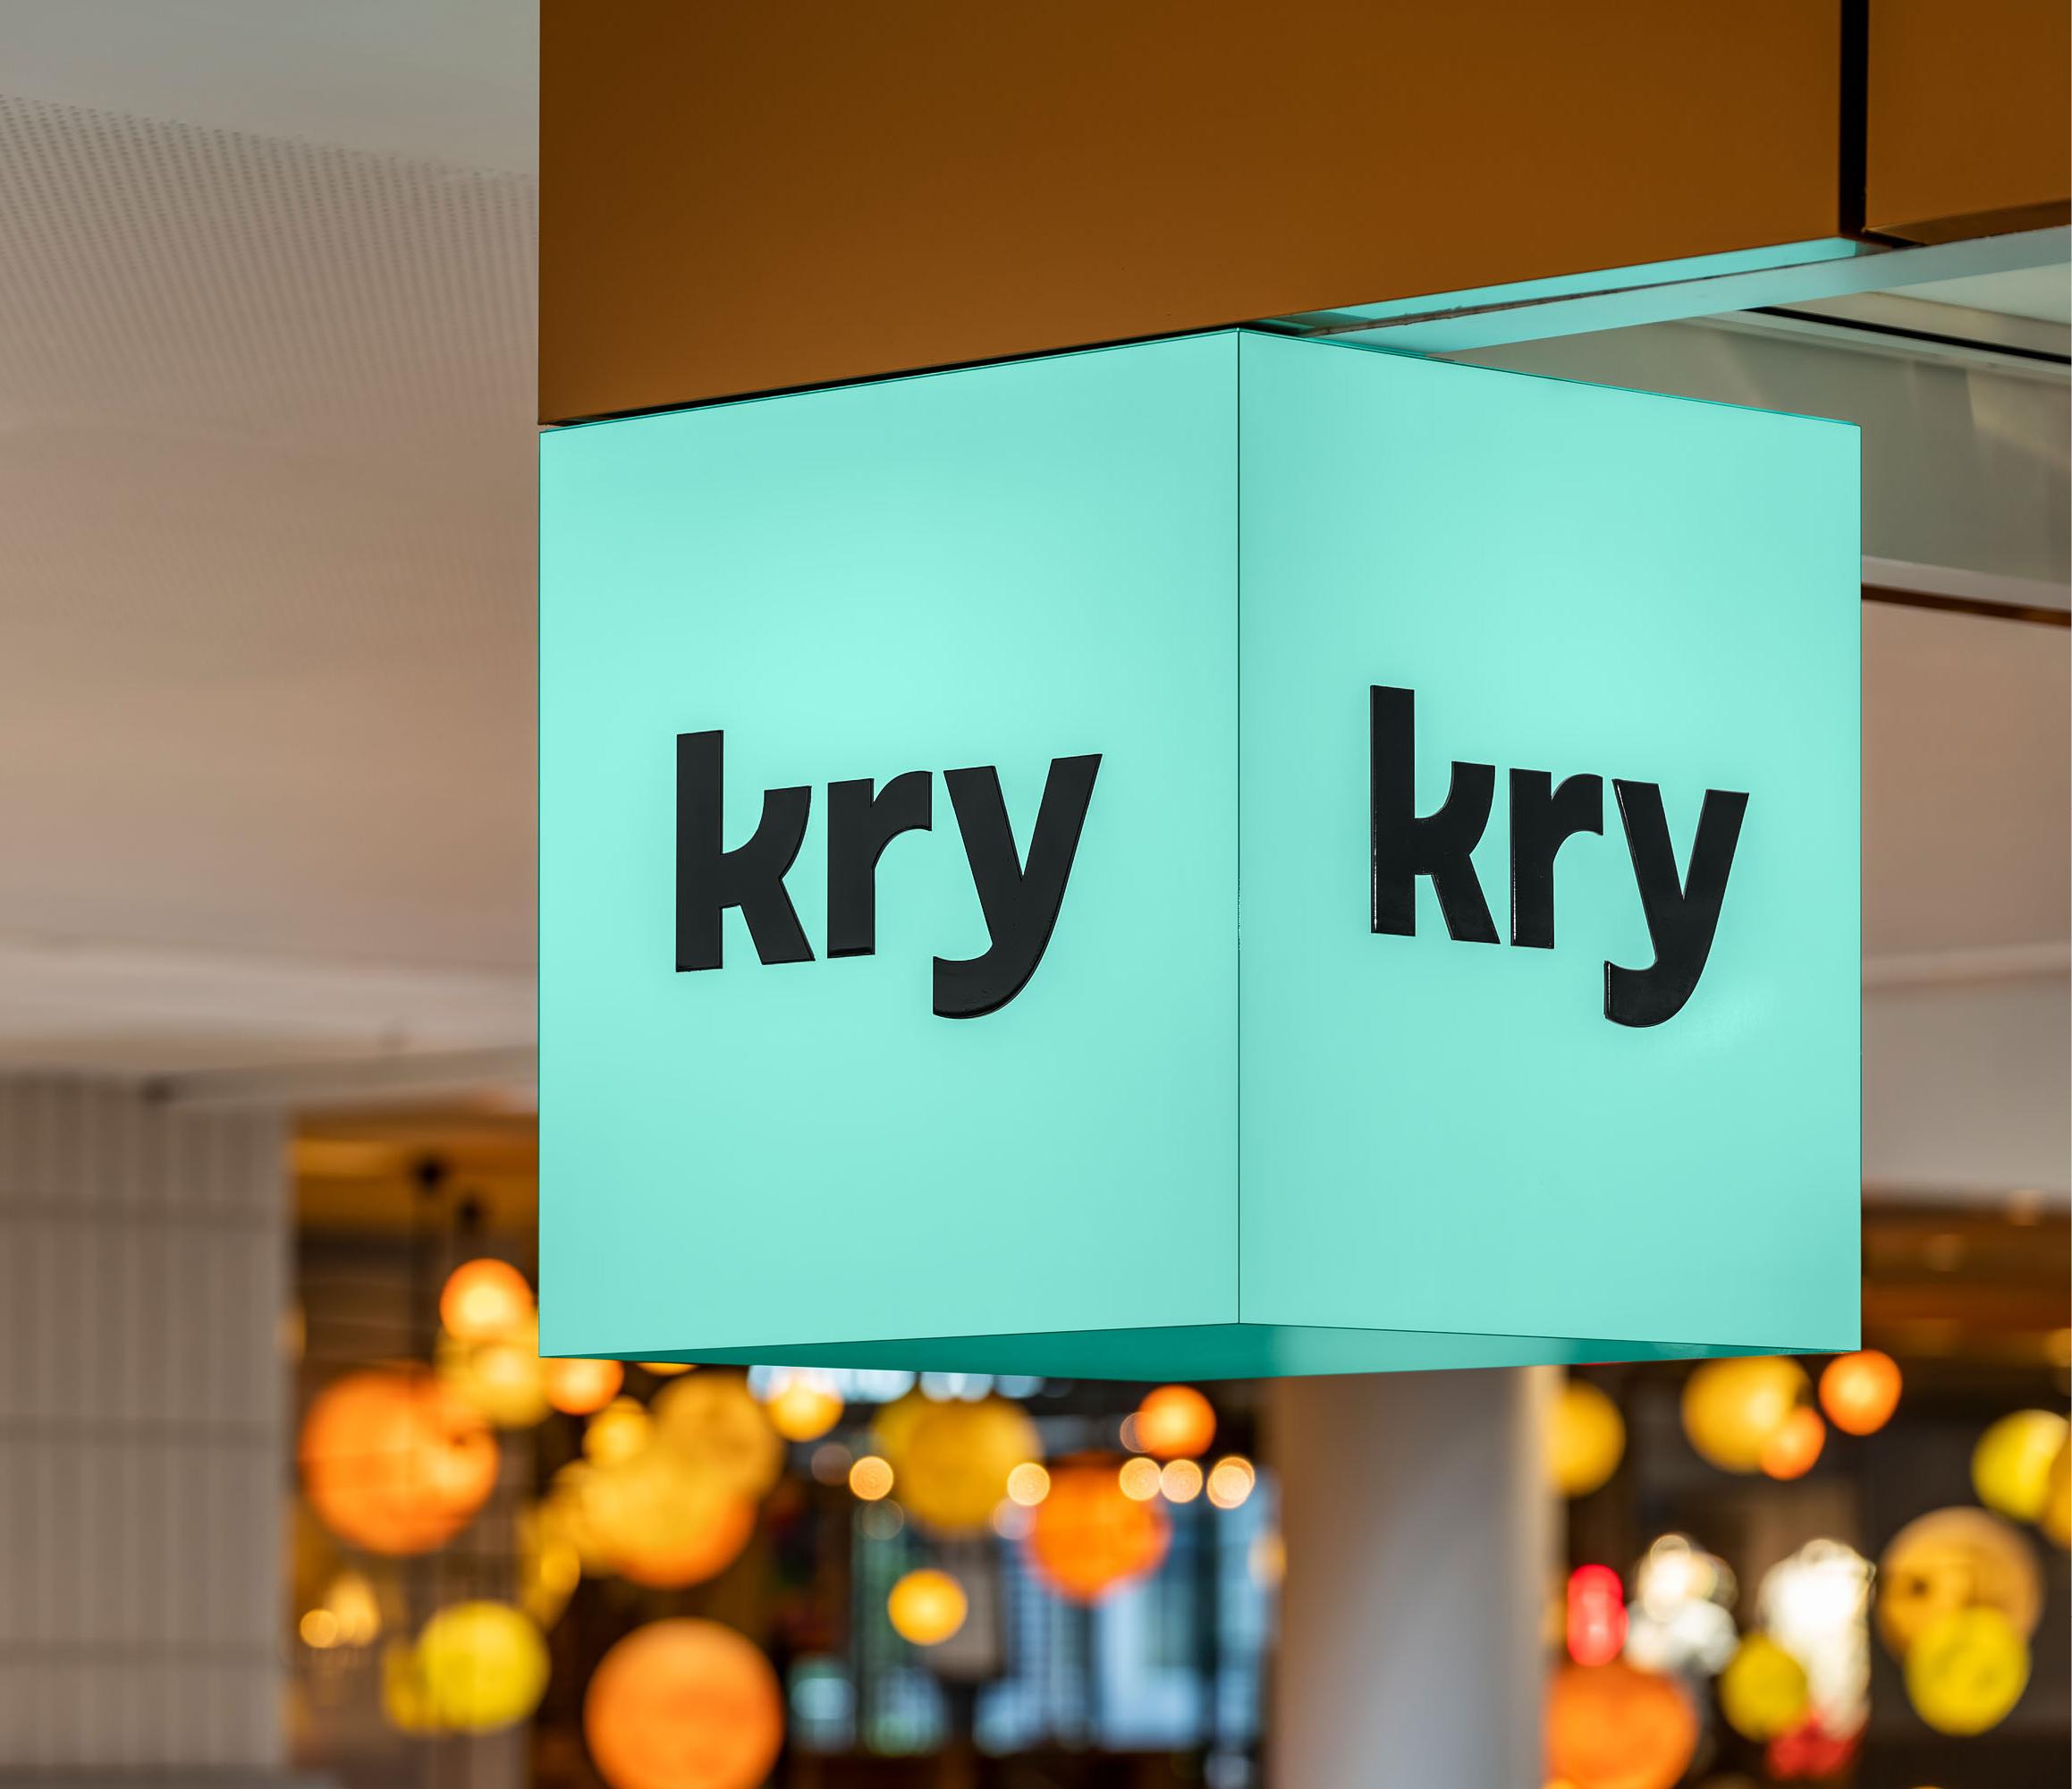 14_kry_image_sign